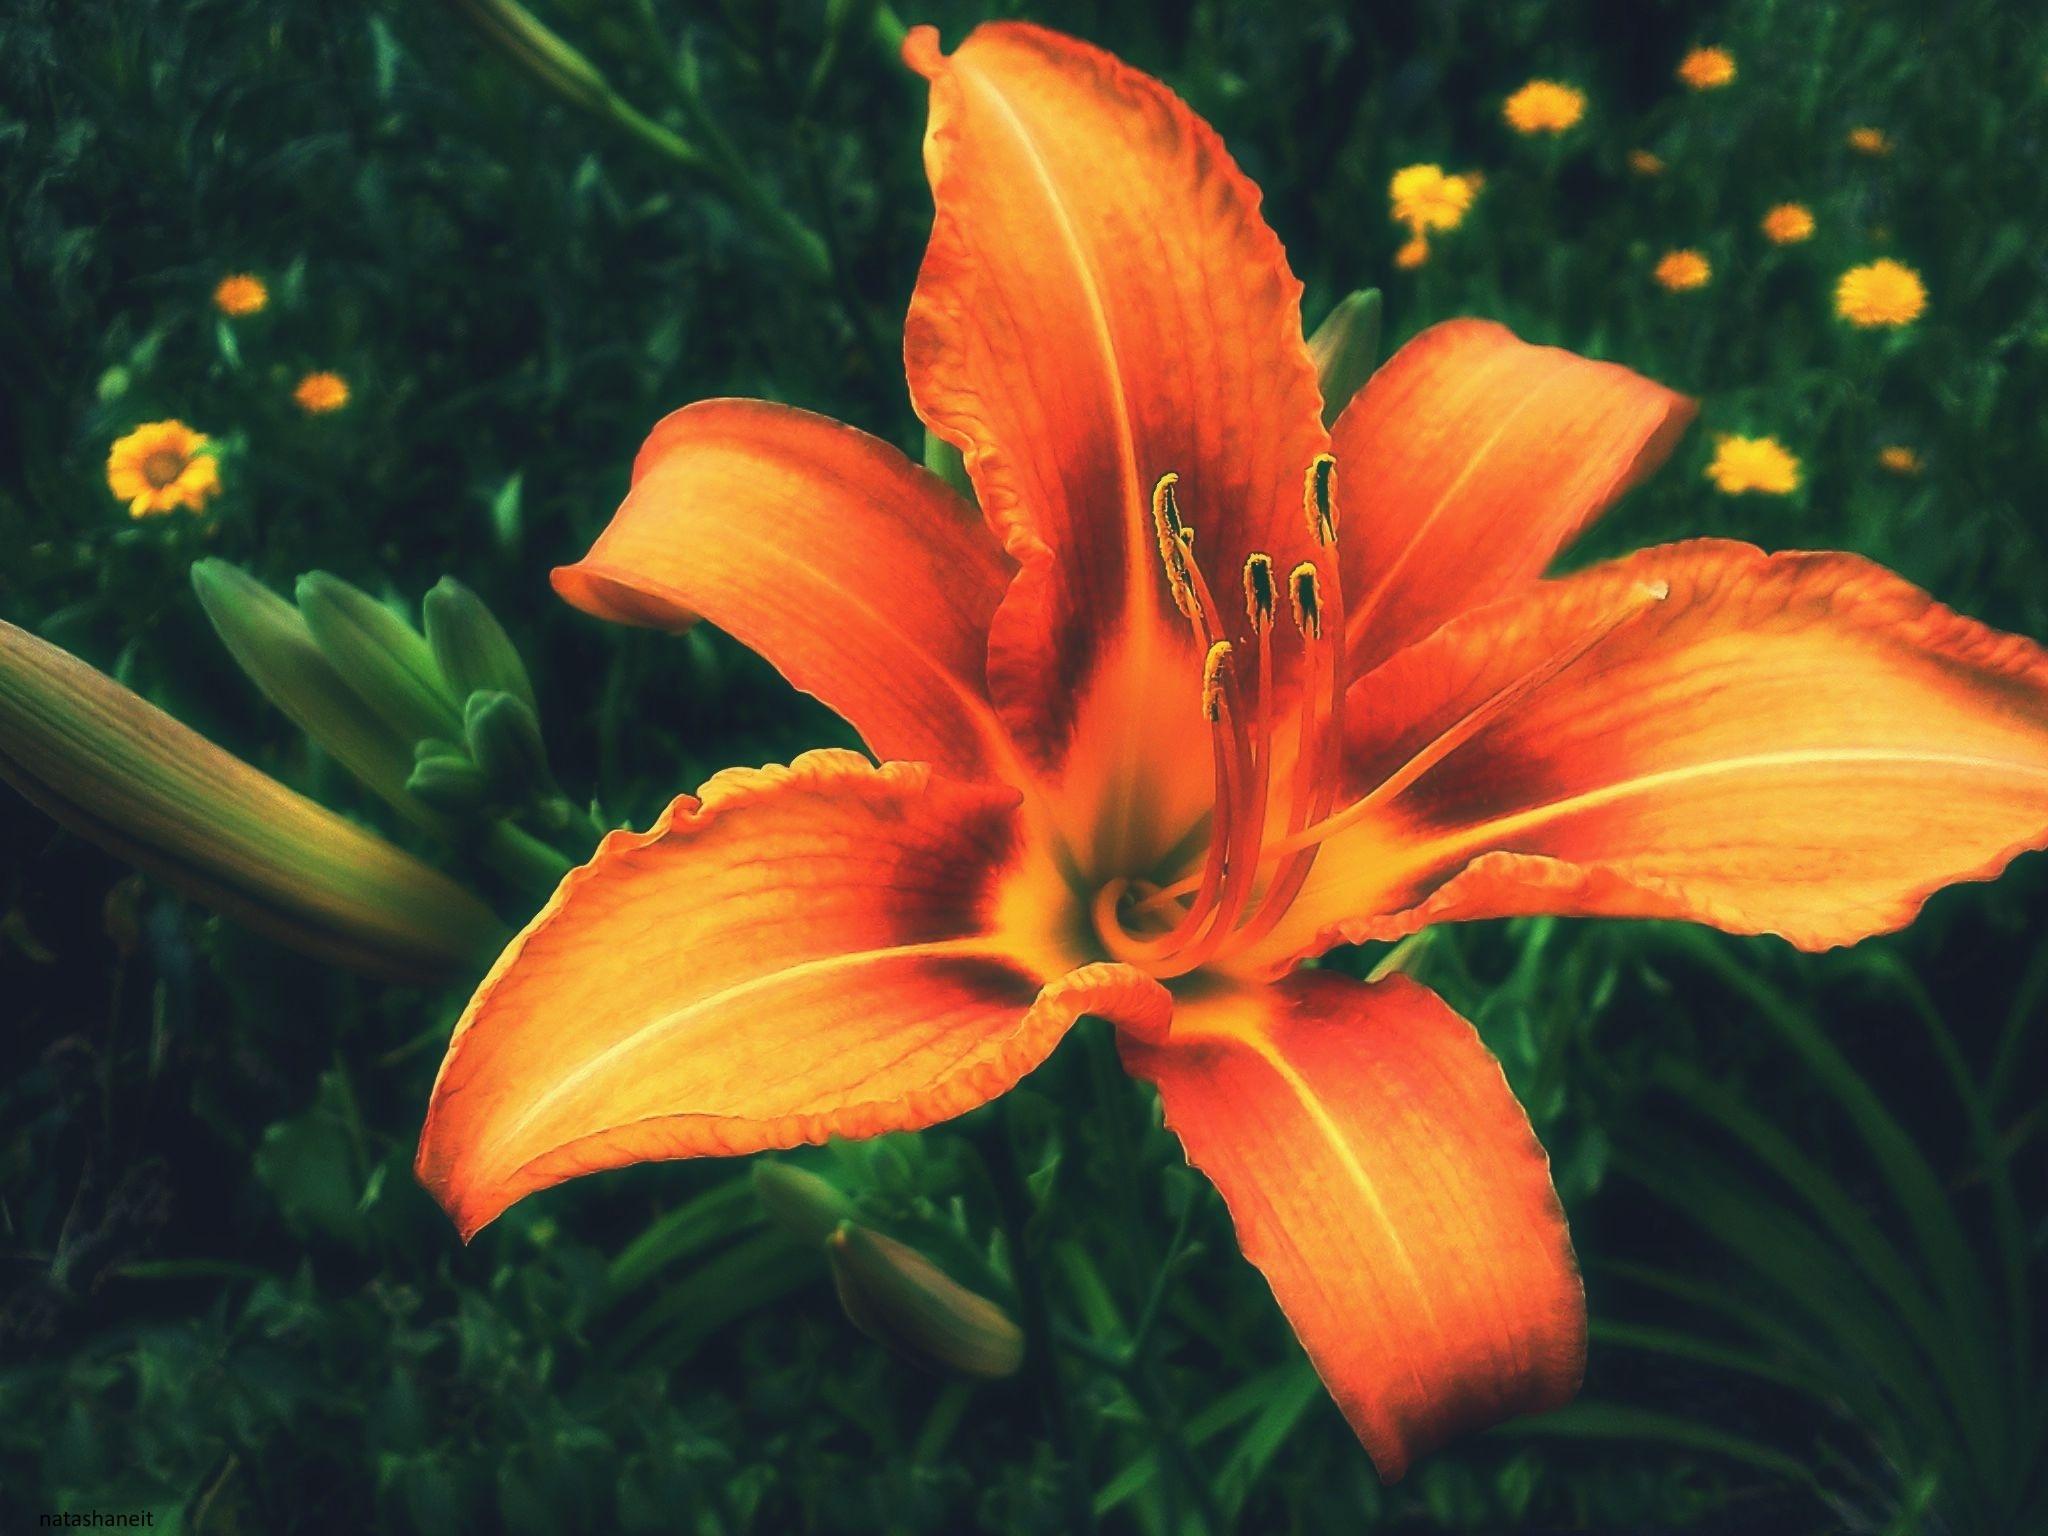 Orange lily and buds by natashaneit